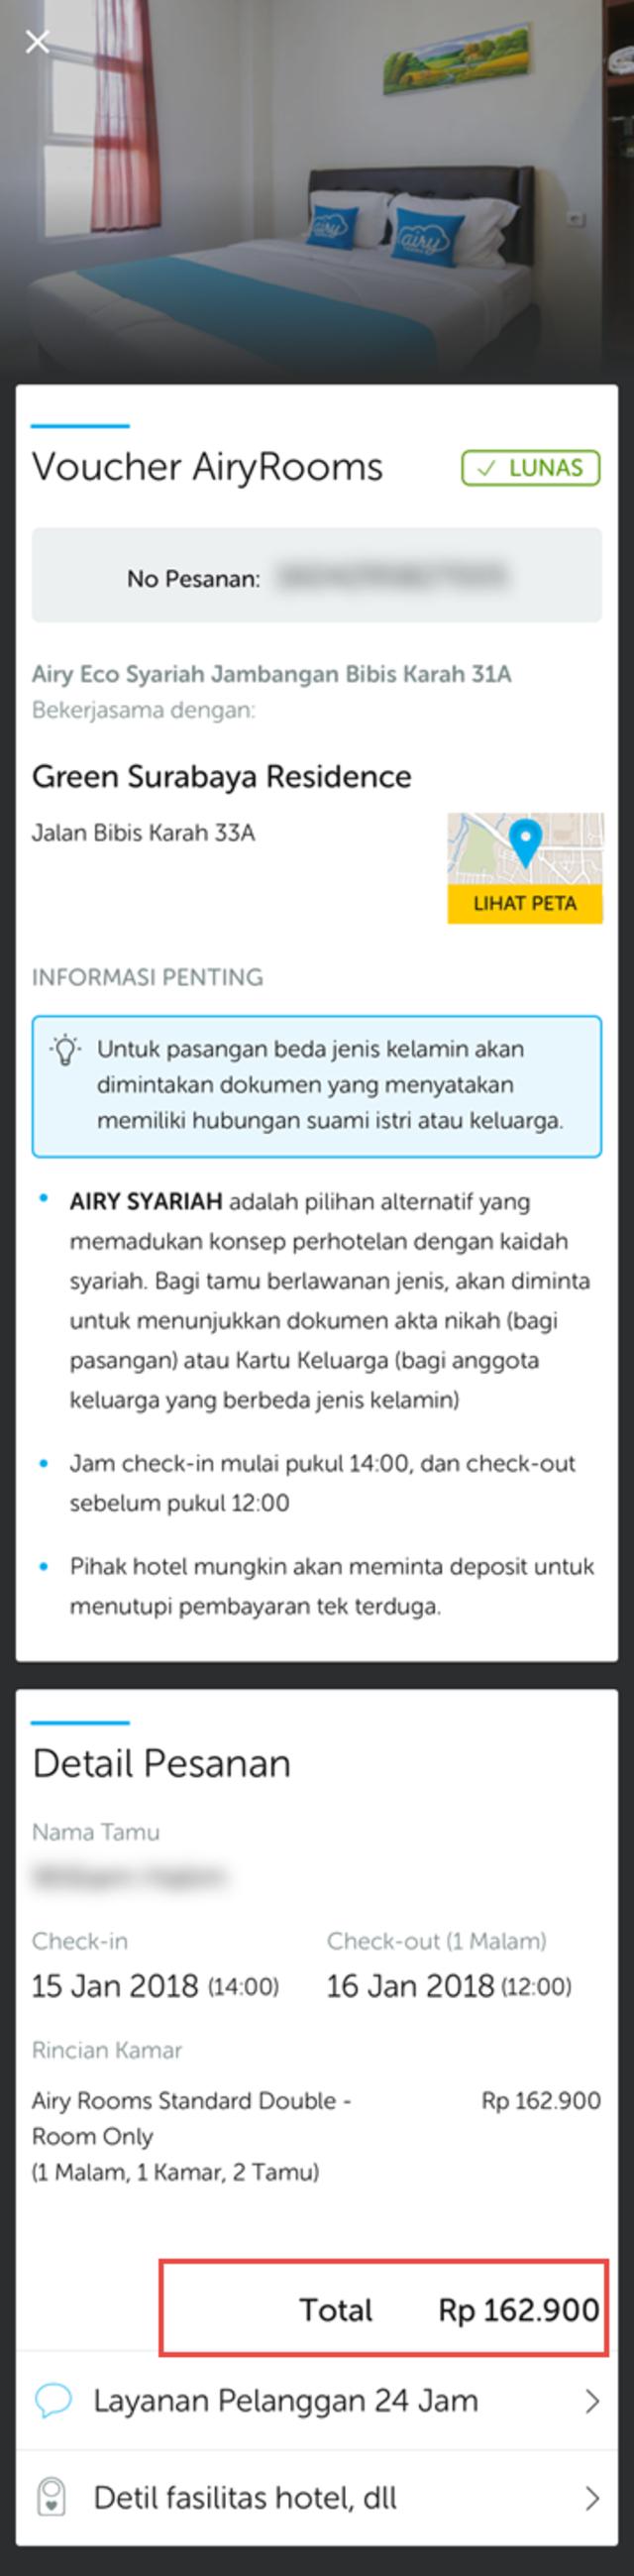 Airy Rooms Memang Anti Bikin Kecewa - Review Pengalaman Gue (2336)